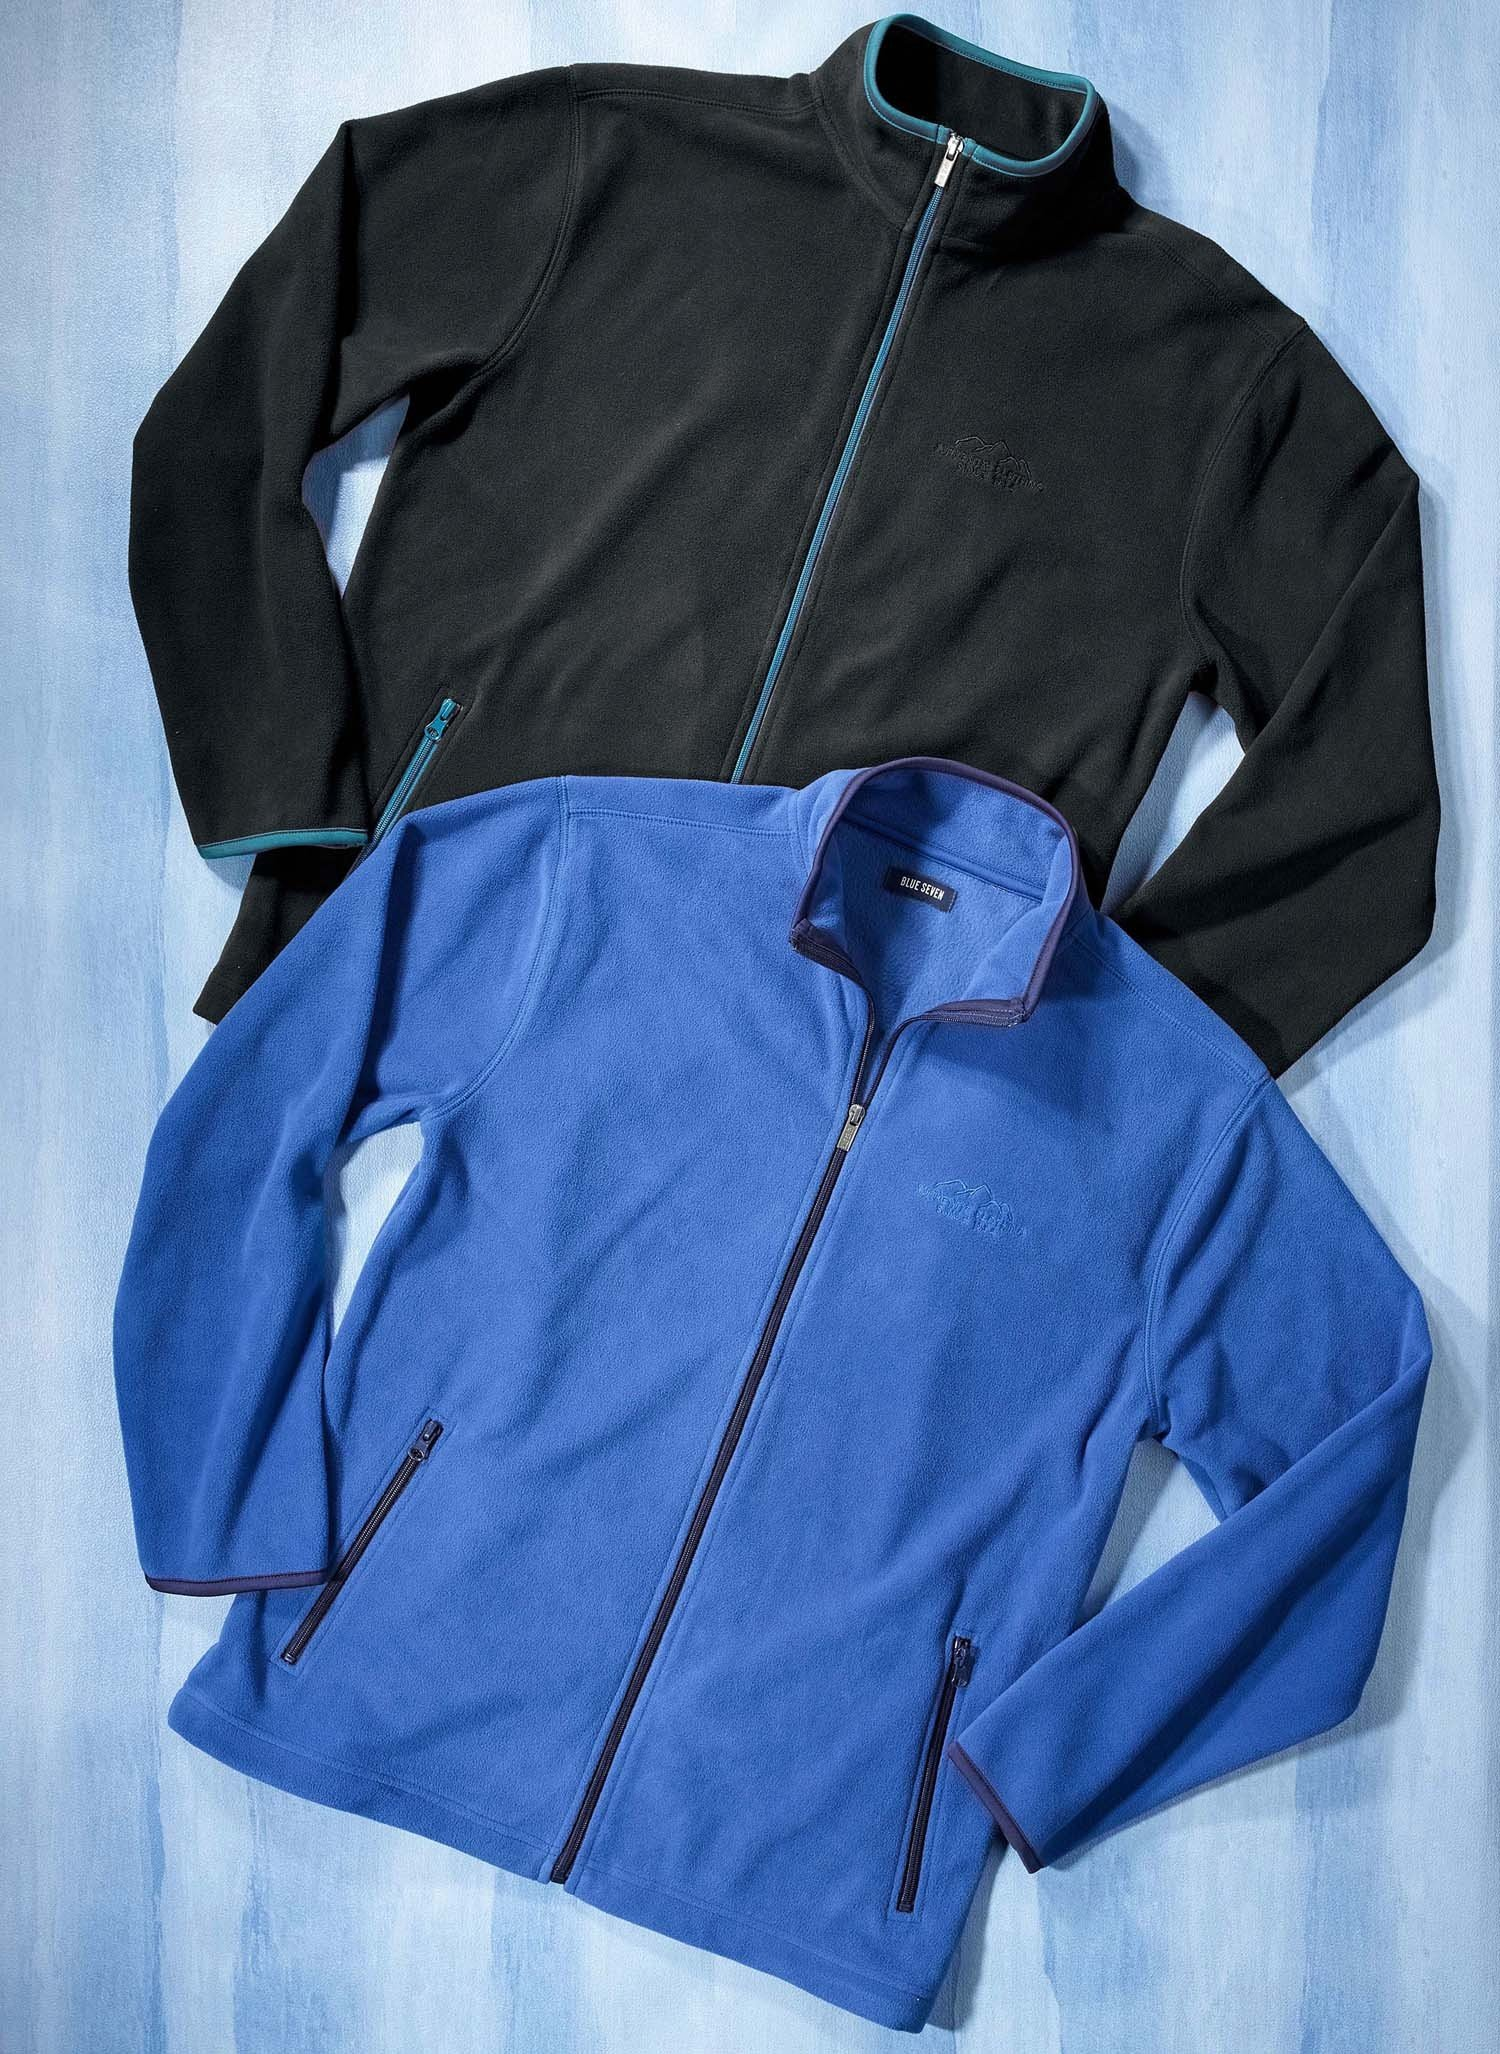 H-Fleece-Jacke schwarz L 010 - 2 - Ronja.ch